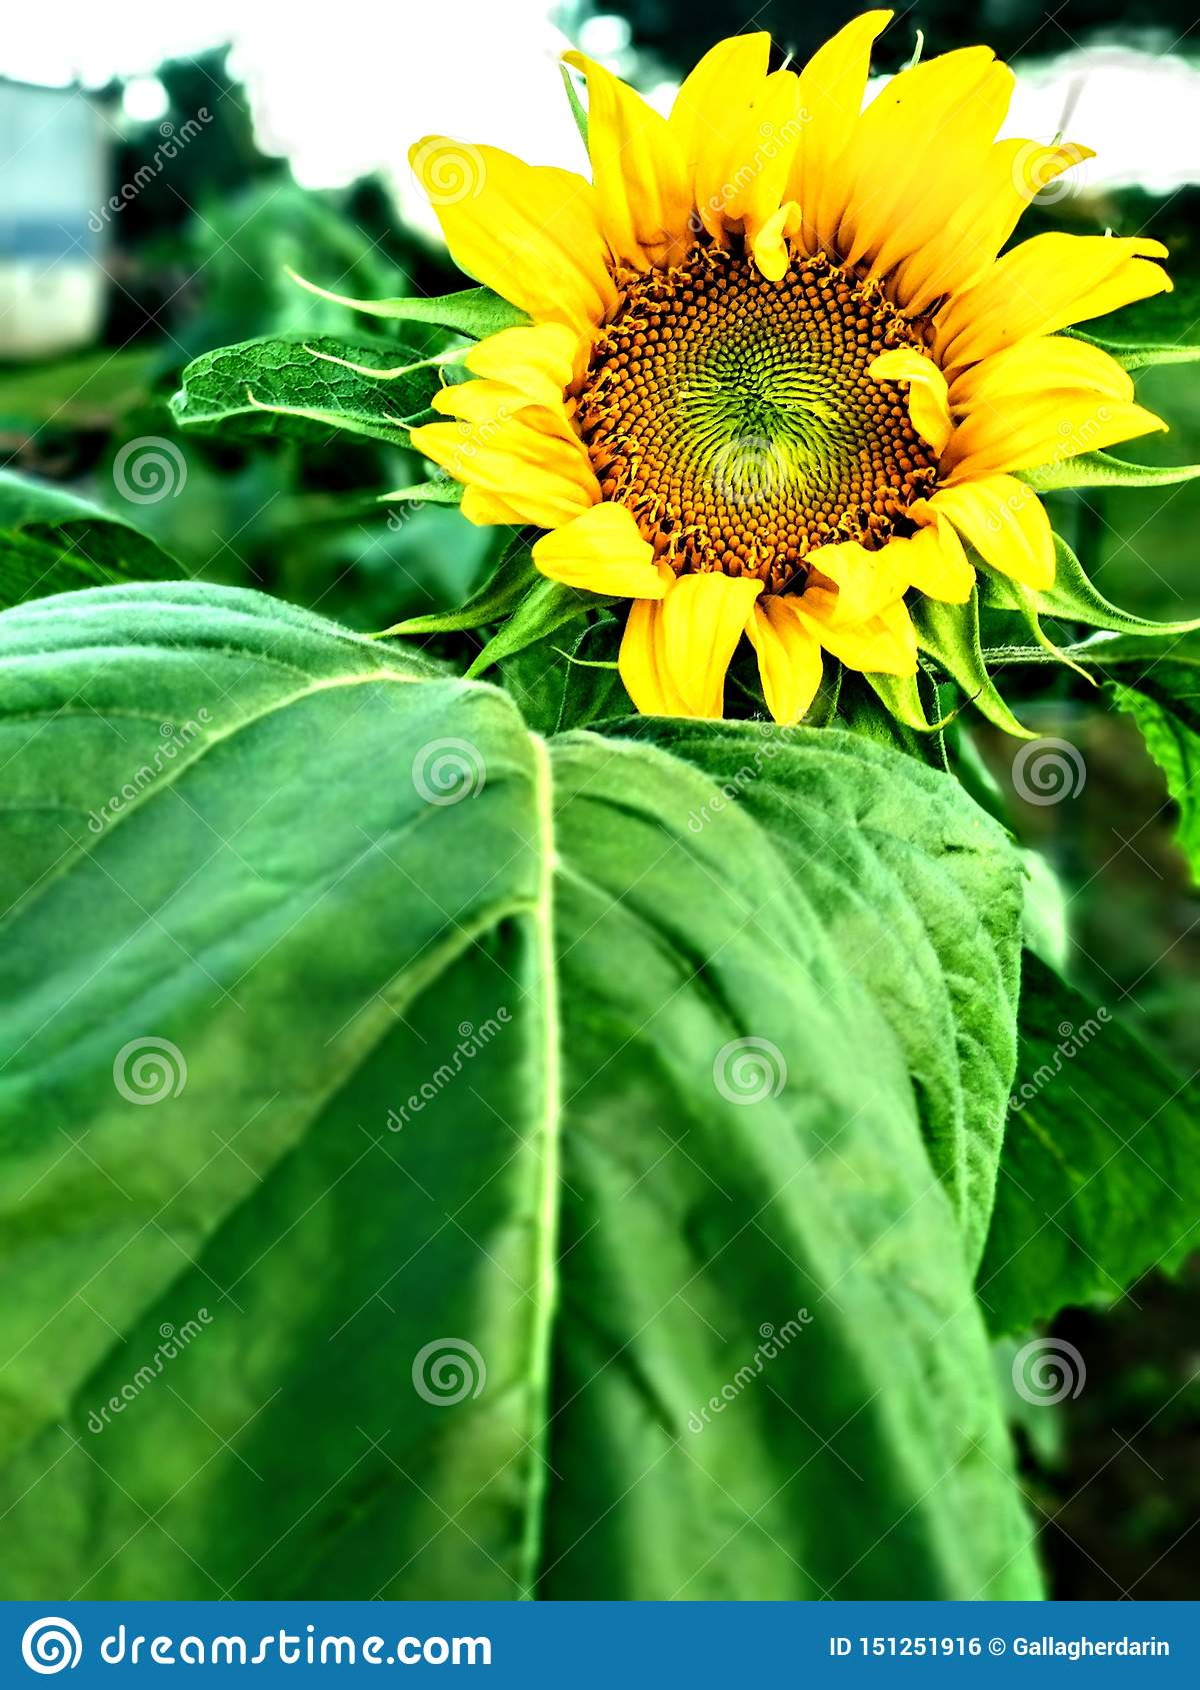 Eerste zonnebloem om te bloeien dit jaar